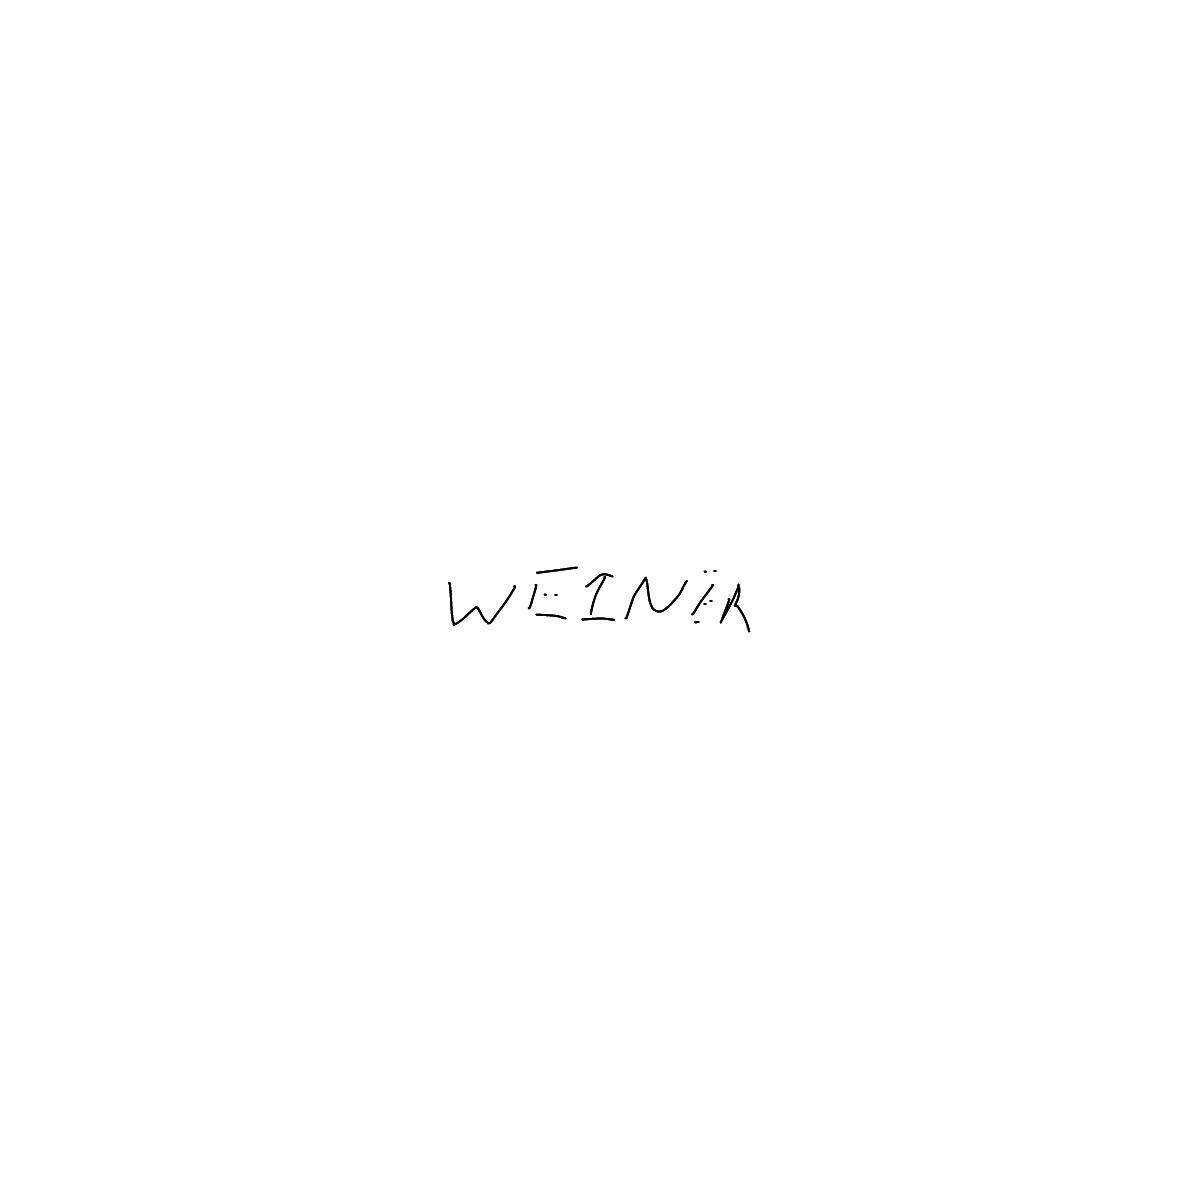 BAAAM drawing#80 lat:46.2736206054687500lng: -63.1100082397460940